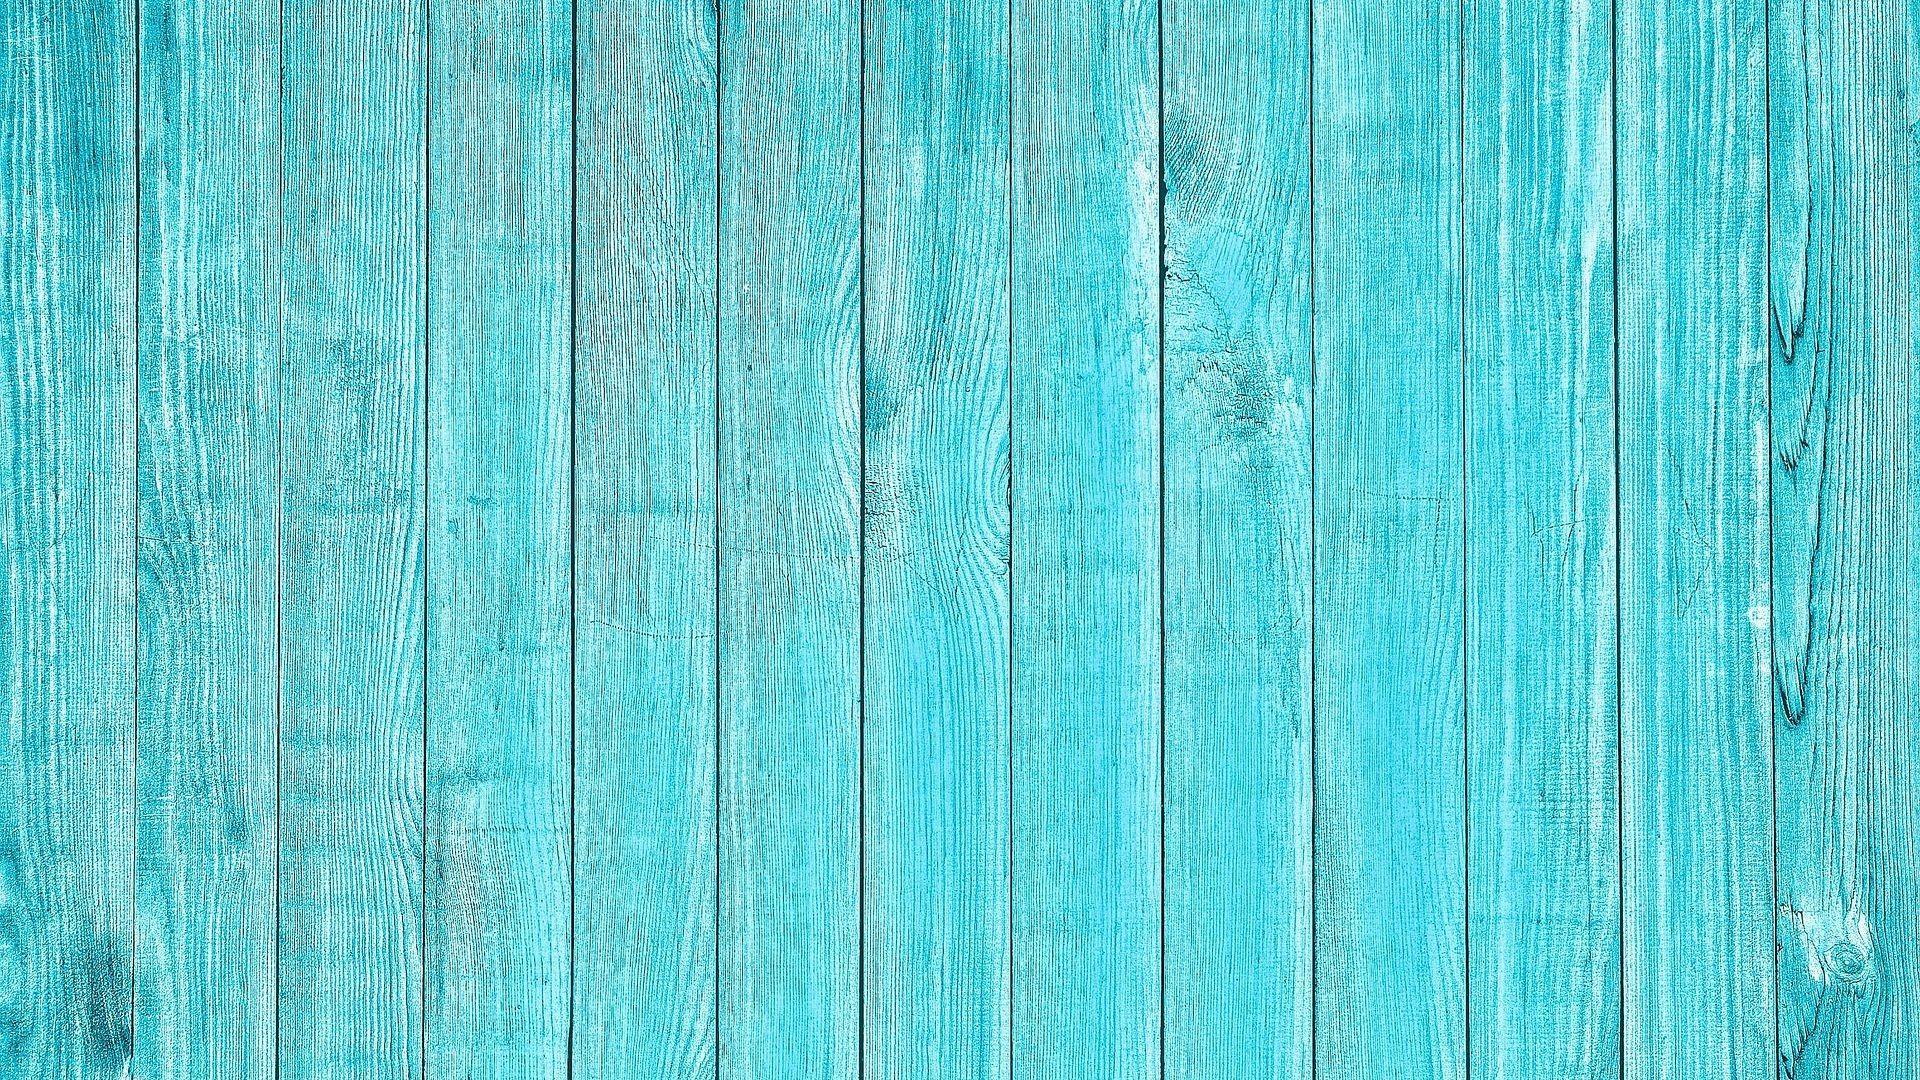 1920x1080 Wooden Wall Light Blue Wallpaper Blue Wallpapers Turquoise Background Wooden Wallpaper